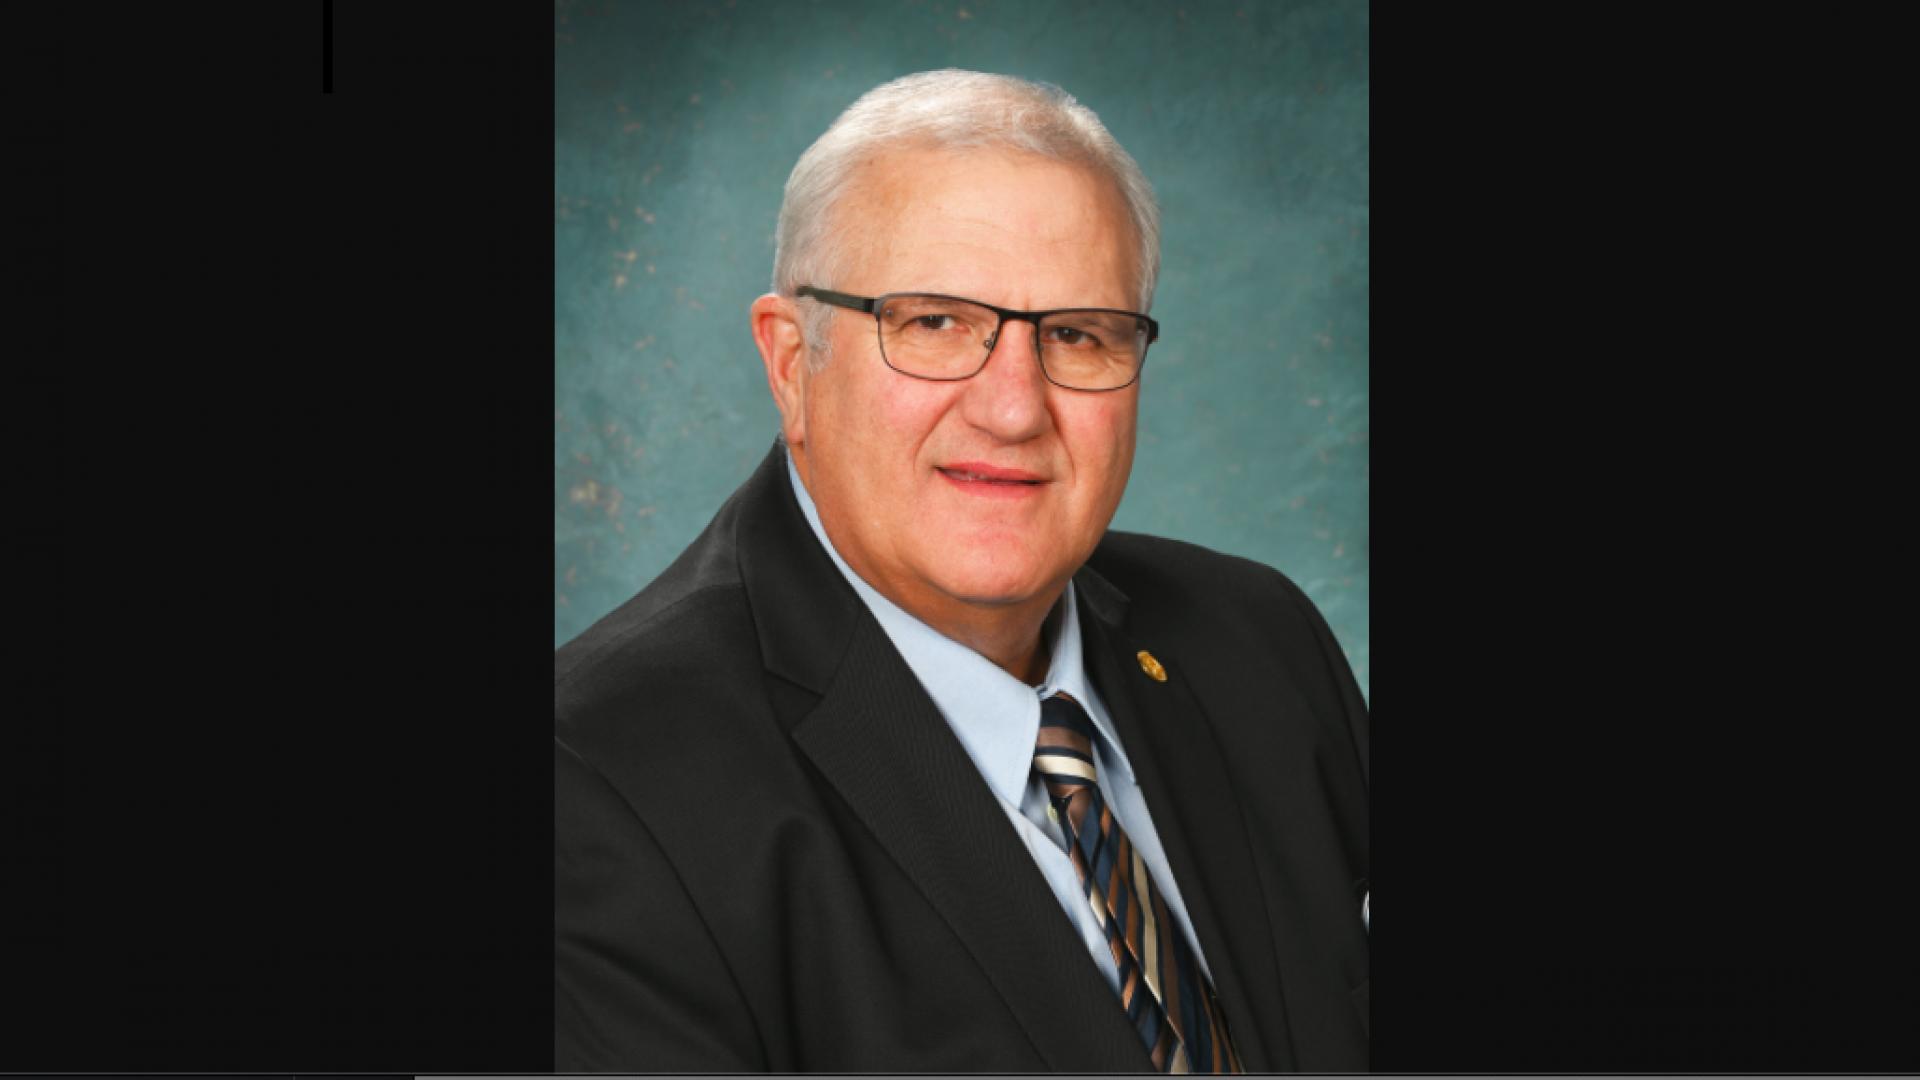 Michigan State Senator Apologizes For Face Mask Resembling Confederate Flag